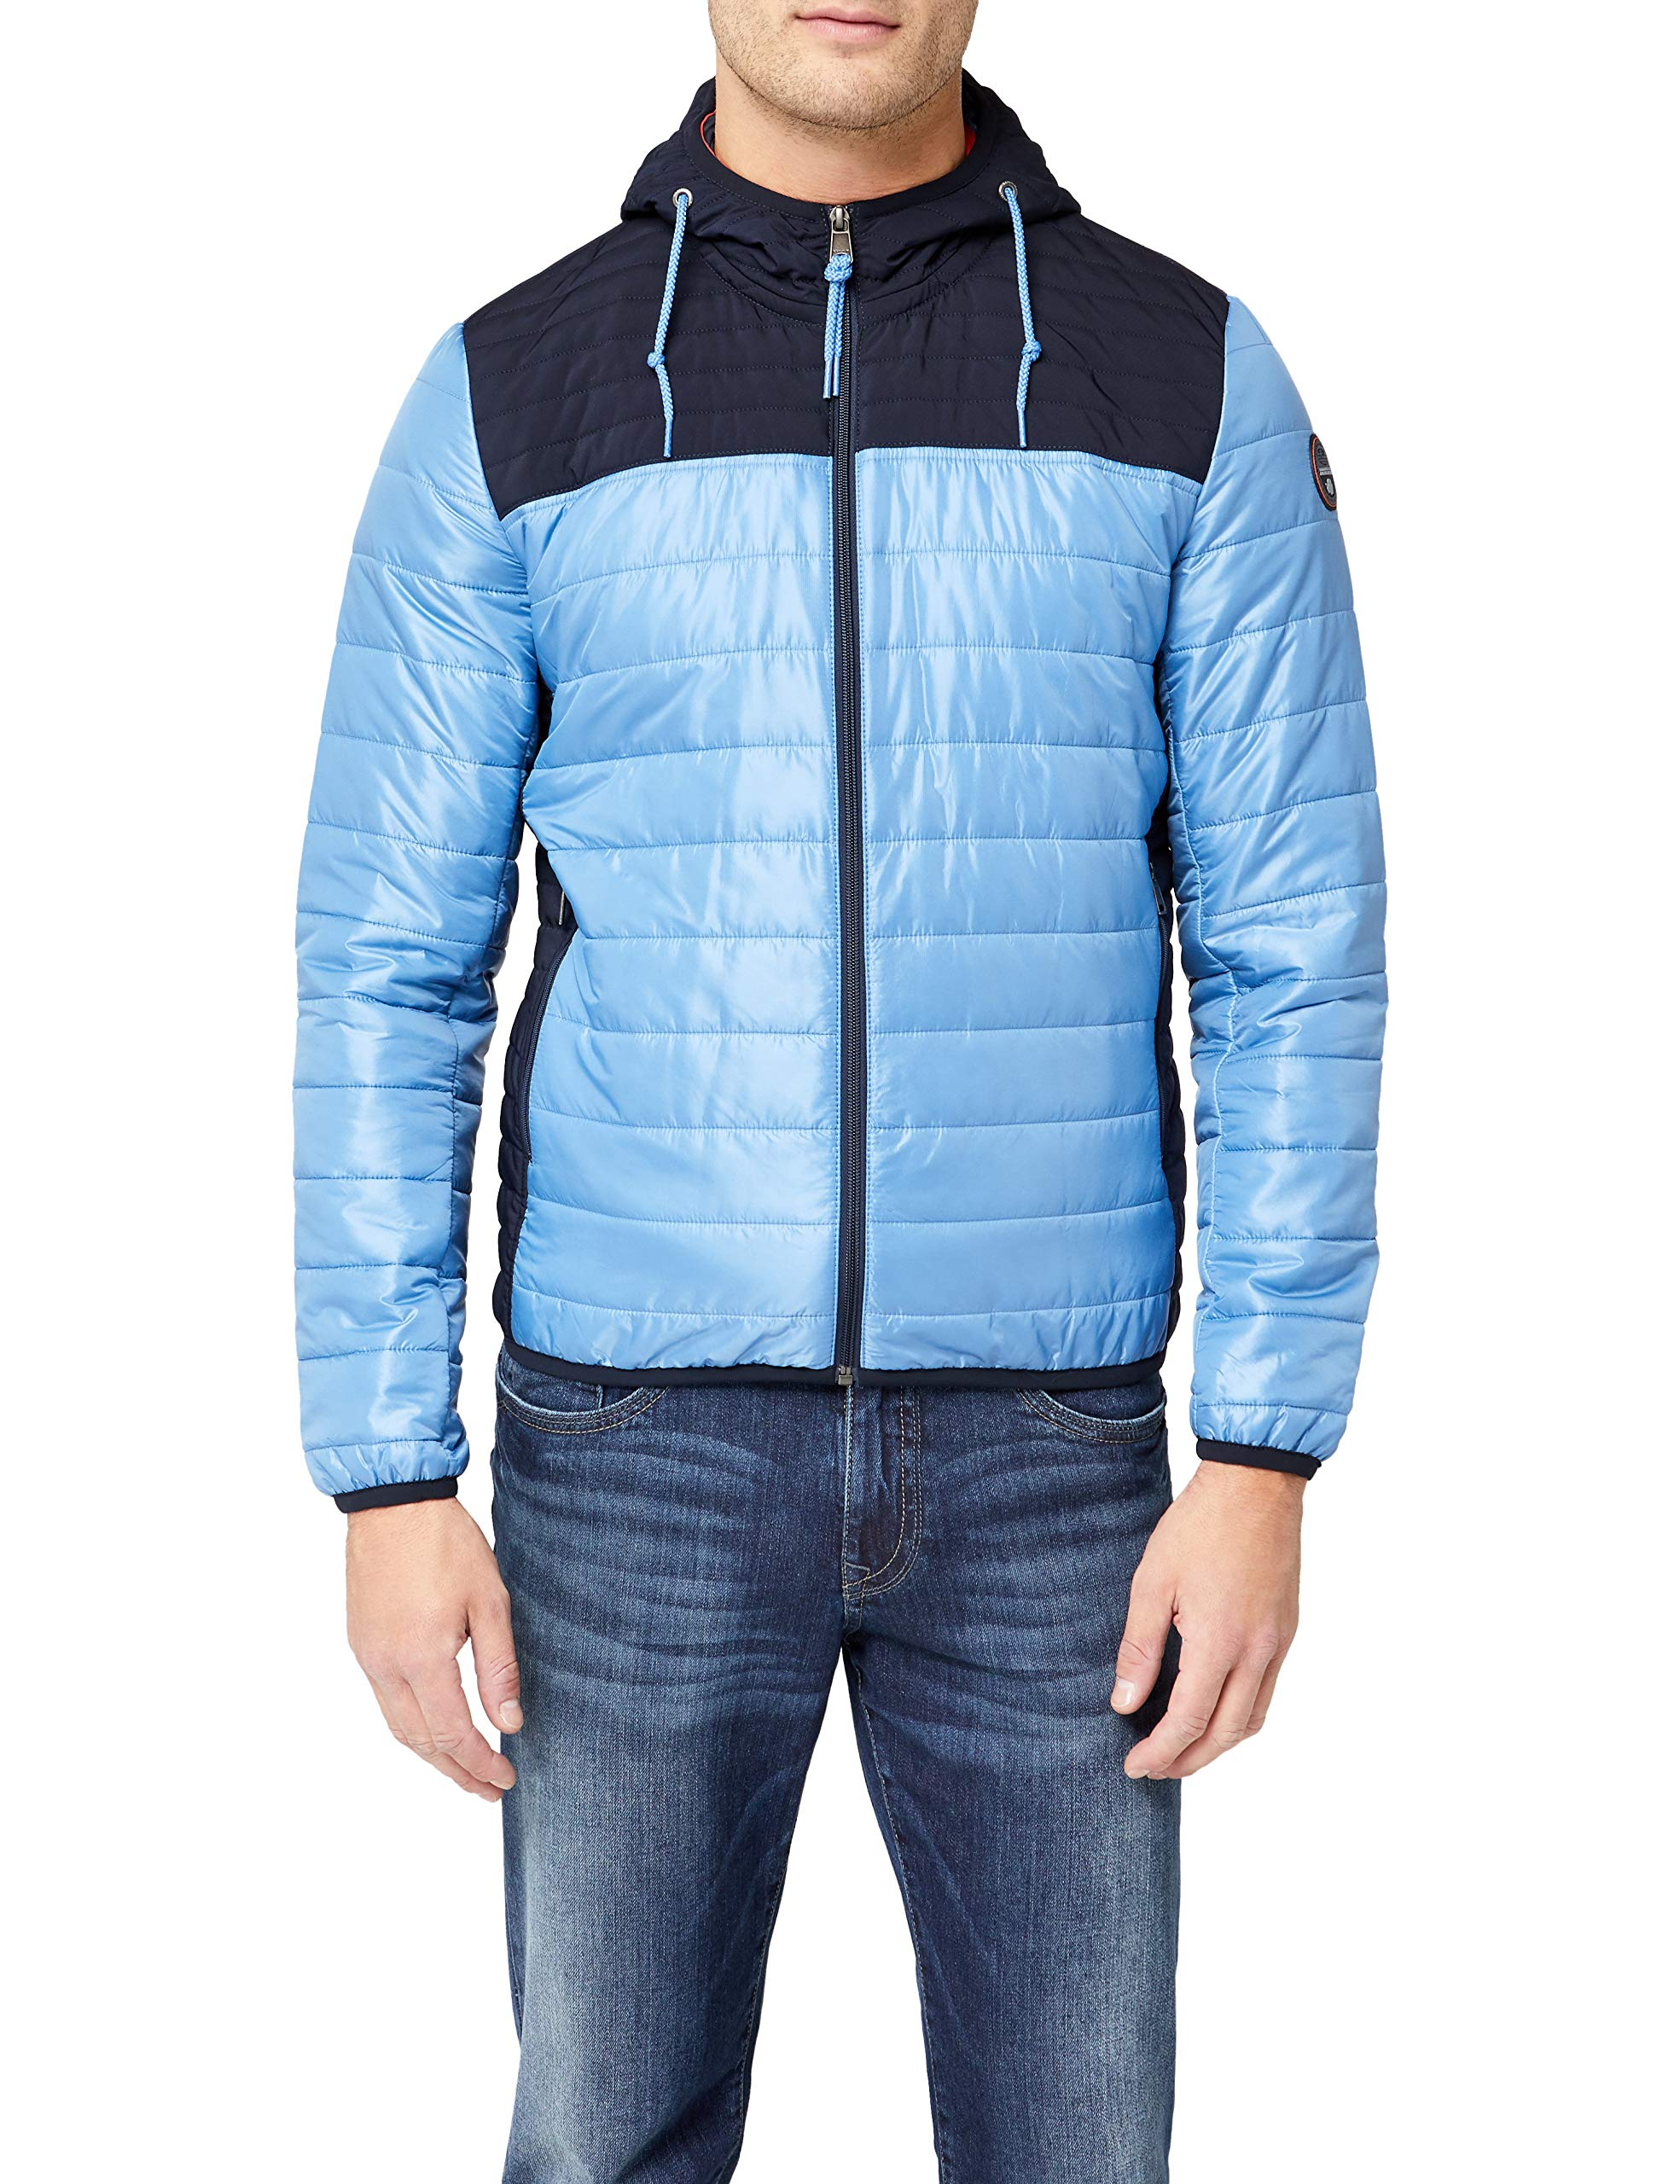 Napapijri Homme Blue Bc2Large Albury BlousonTurquoiselight YHe9EWD2I